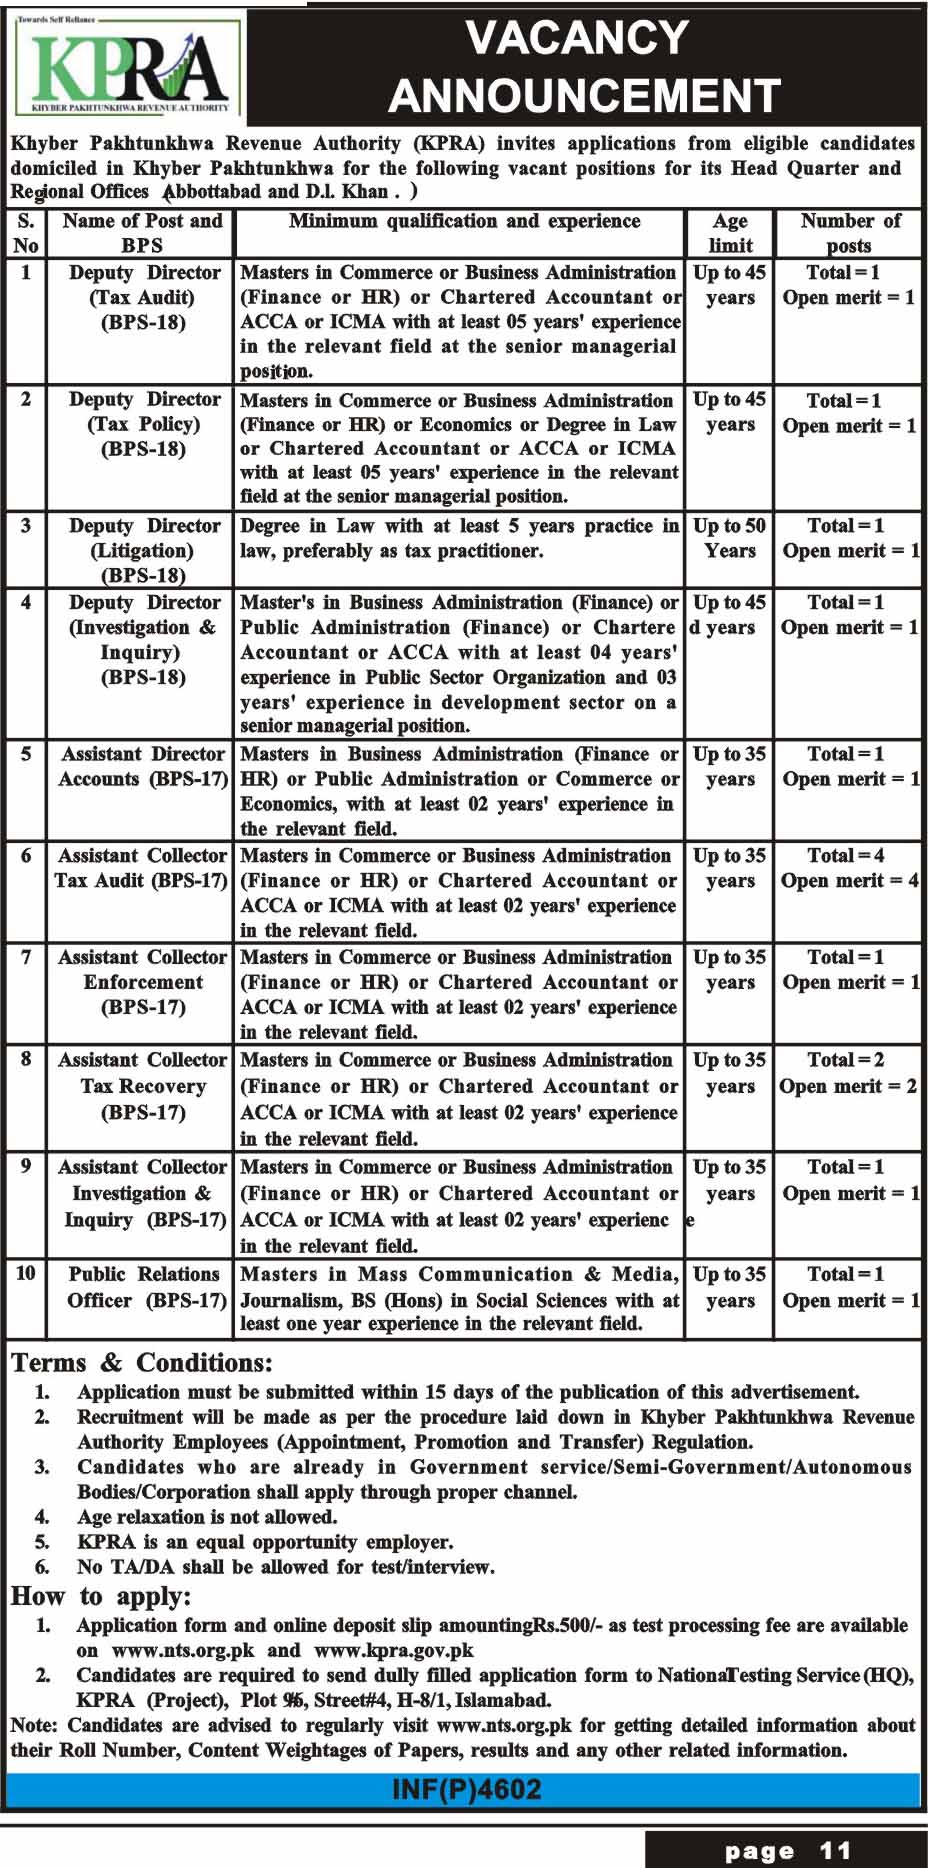 Khyber Pakhtunkhwa Revenue Authority NTS Jobs 2018 Application Form